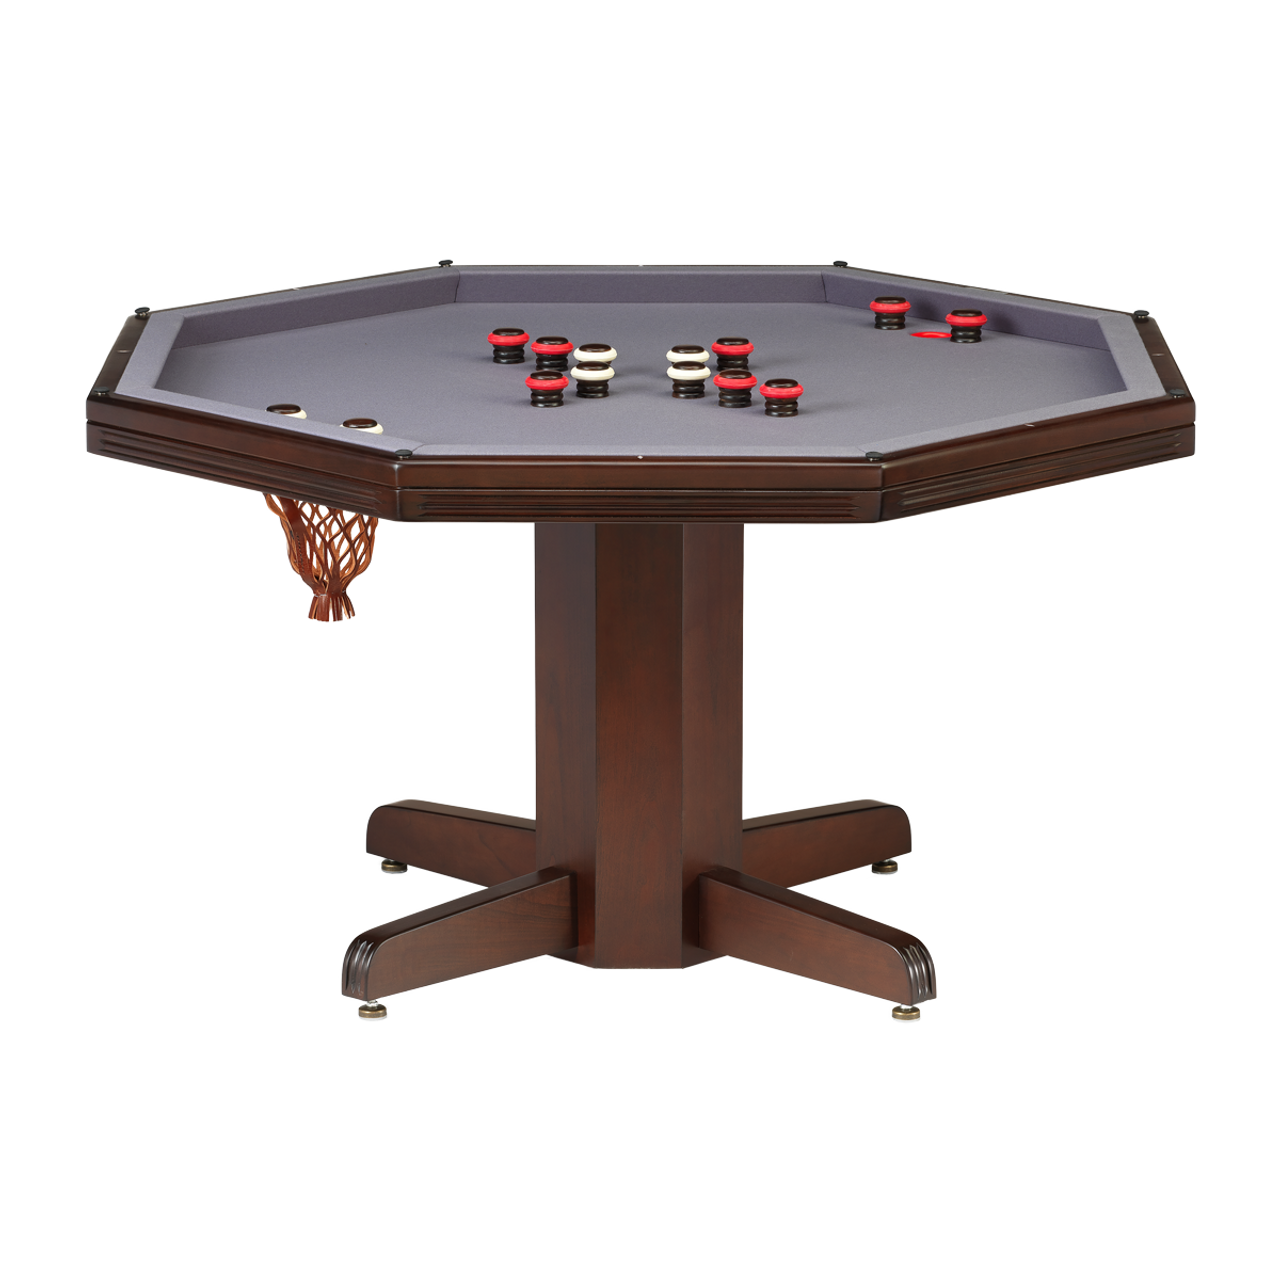 Darafeev Reno Poker Dining Game Table with Bumper Pool